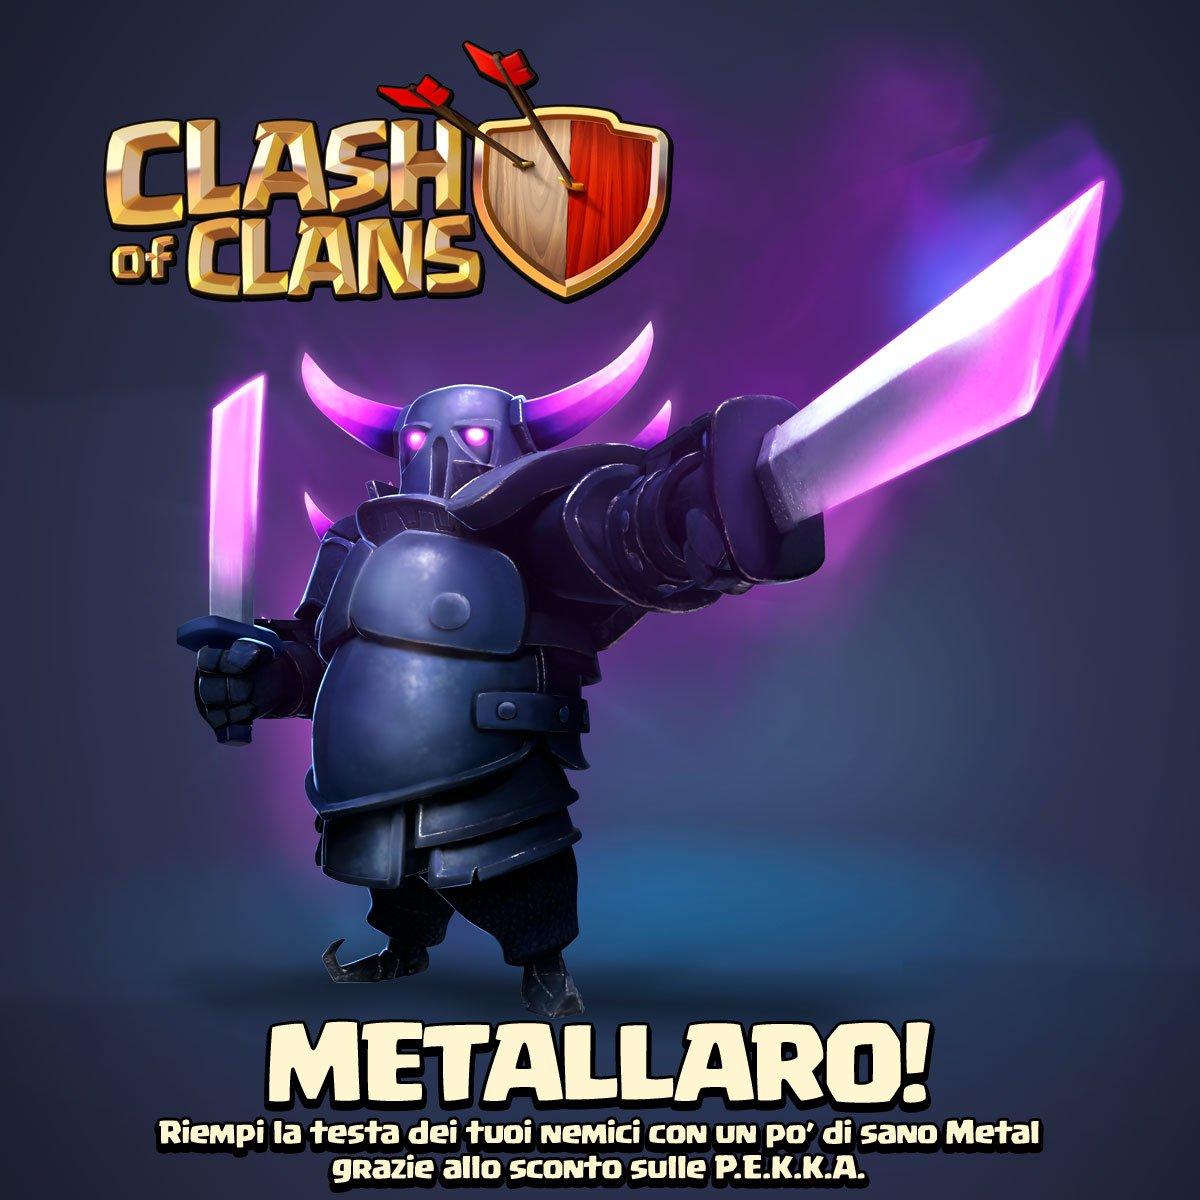 Clash Of Clans It Clashofclansit4 Twitter